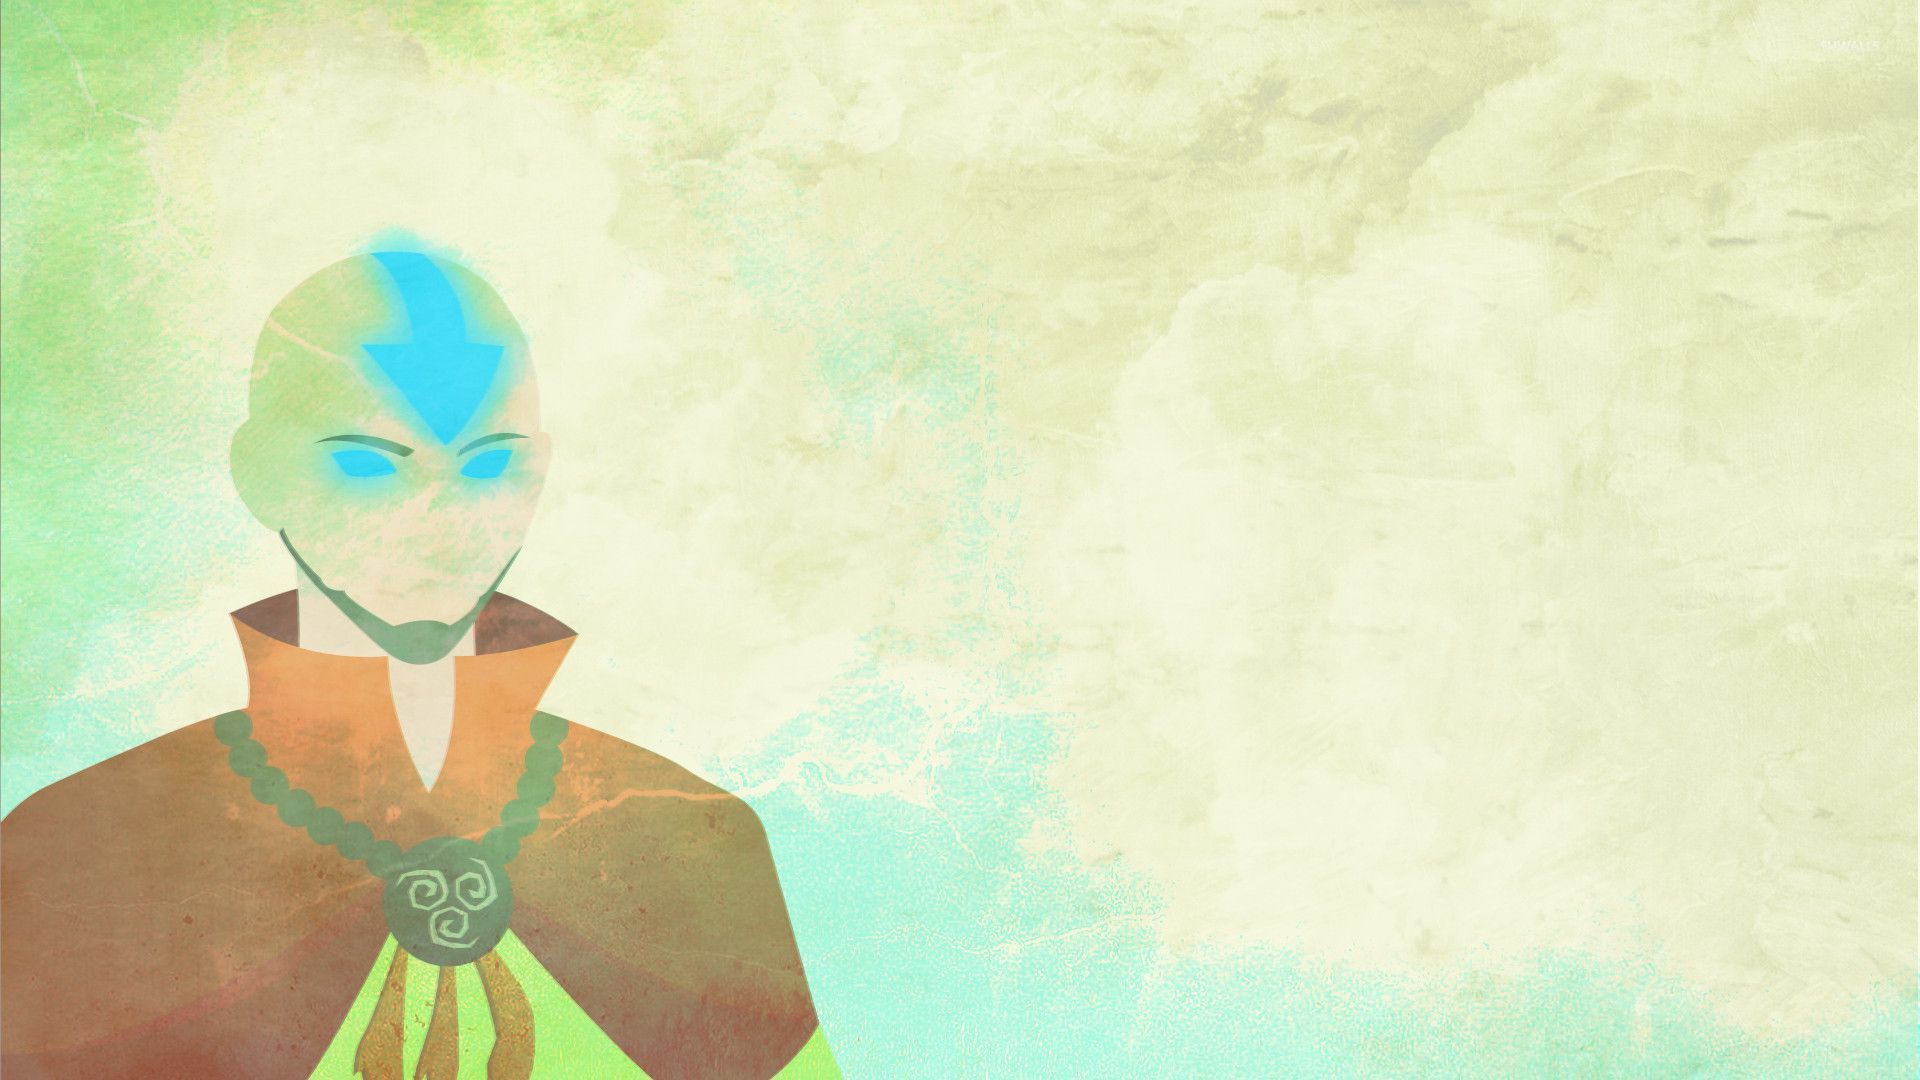 Aang - Avatar - The Last Airbender wallpaper - Cartoon ...